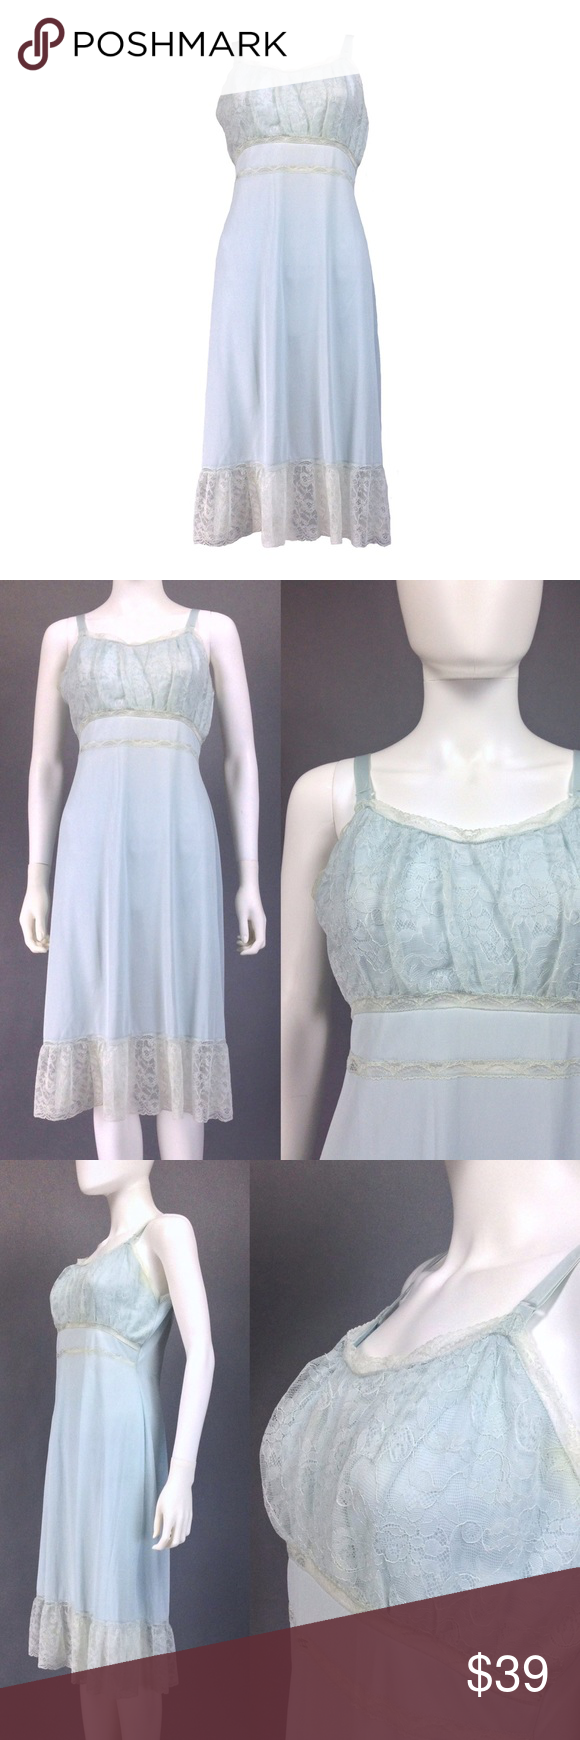 VINTAGE LINGERIE 50s Slip LACE HEM Powder Blue Coming soon Vintage Intimates & Sleepwear Chemises & Slips